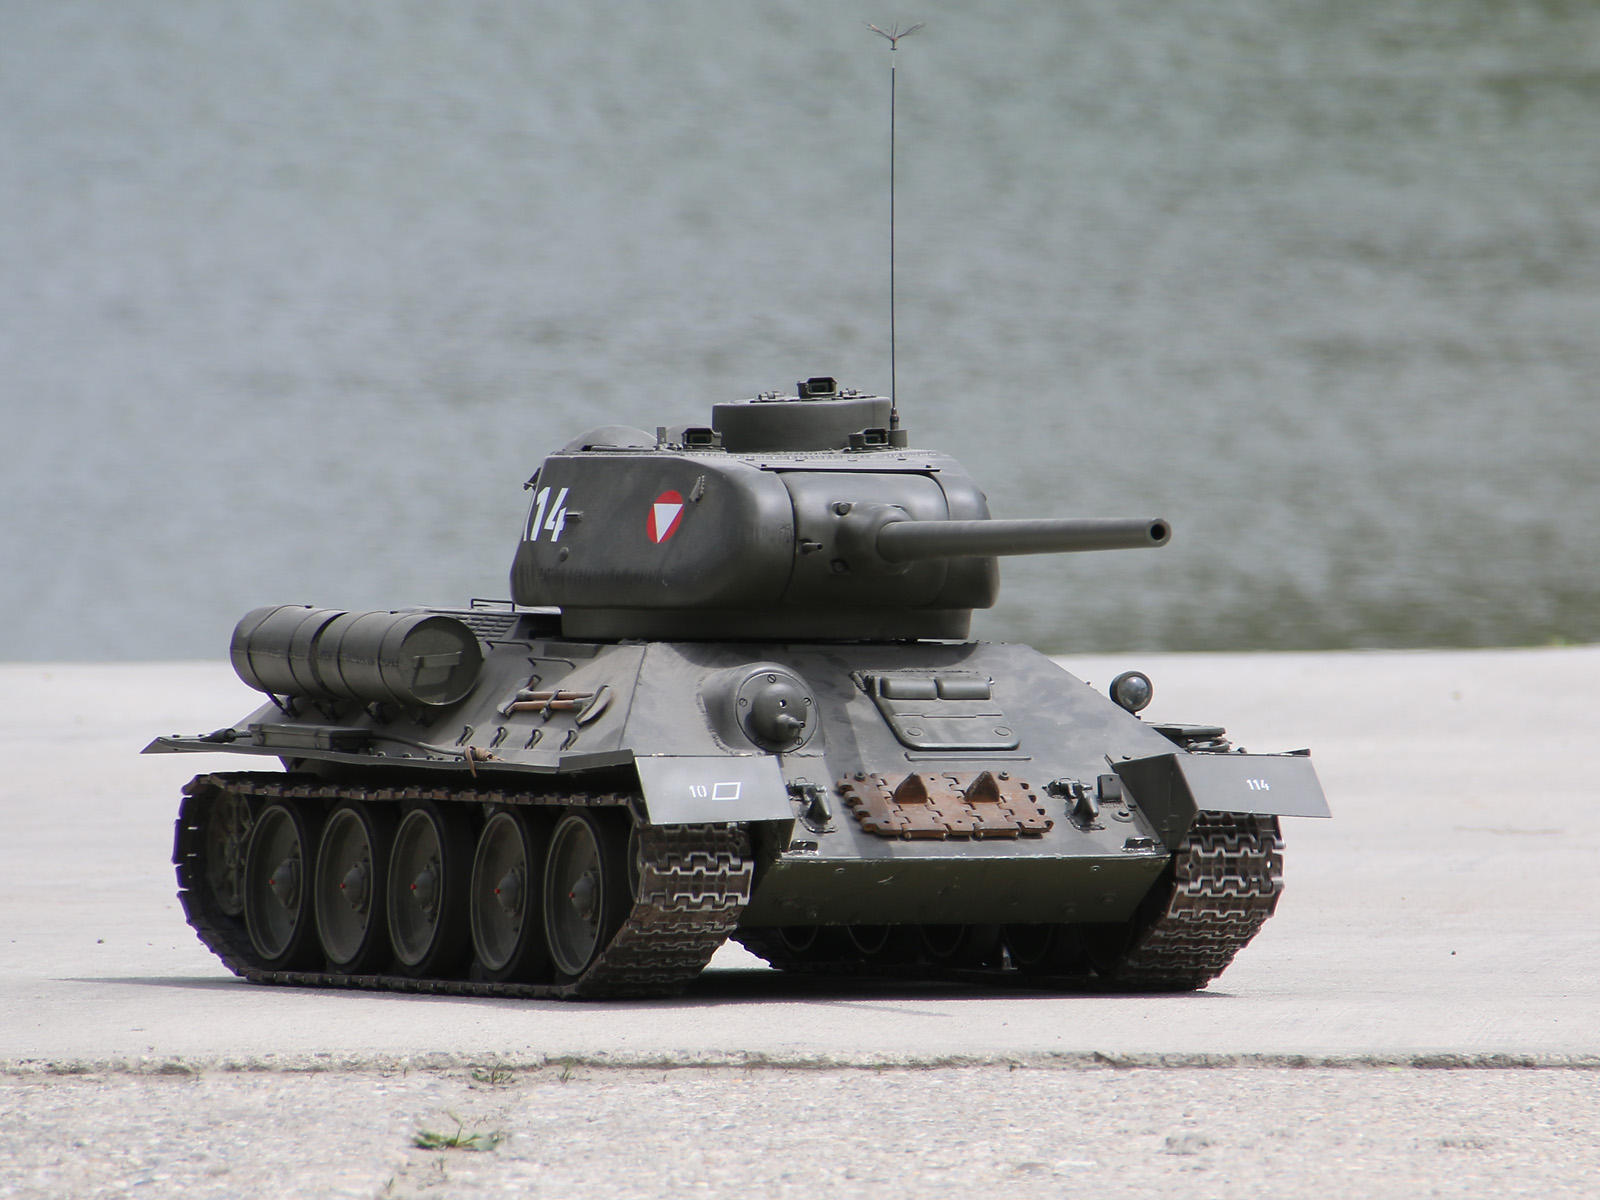 Ferngesteuerter T-34 Kampfpanzer des Bundesheeres © Doppeladler.com